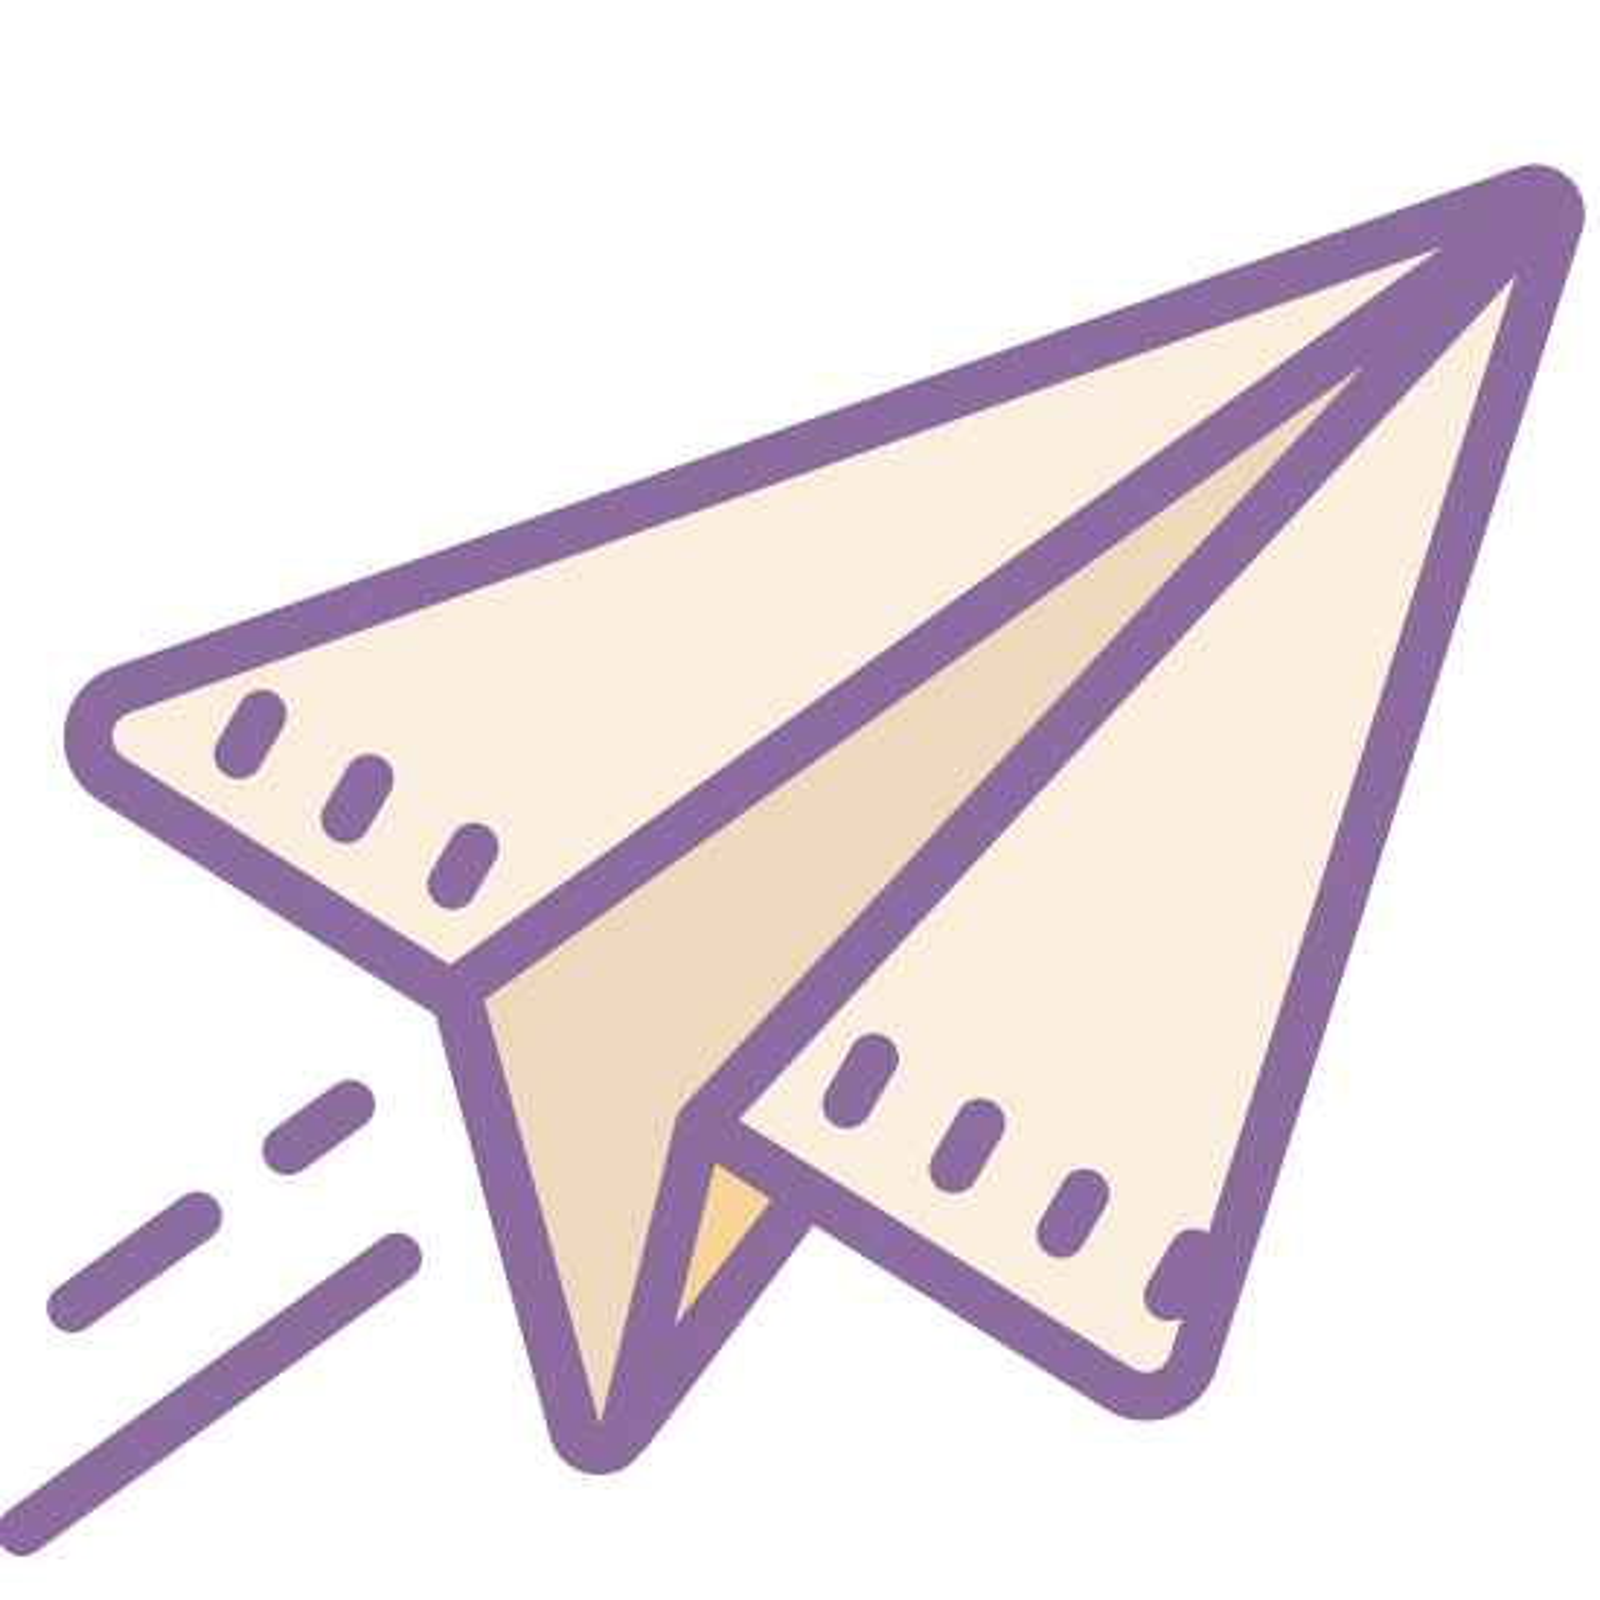 紙飛行機 icon